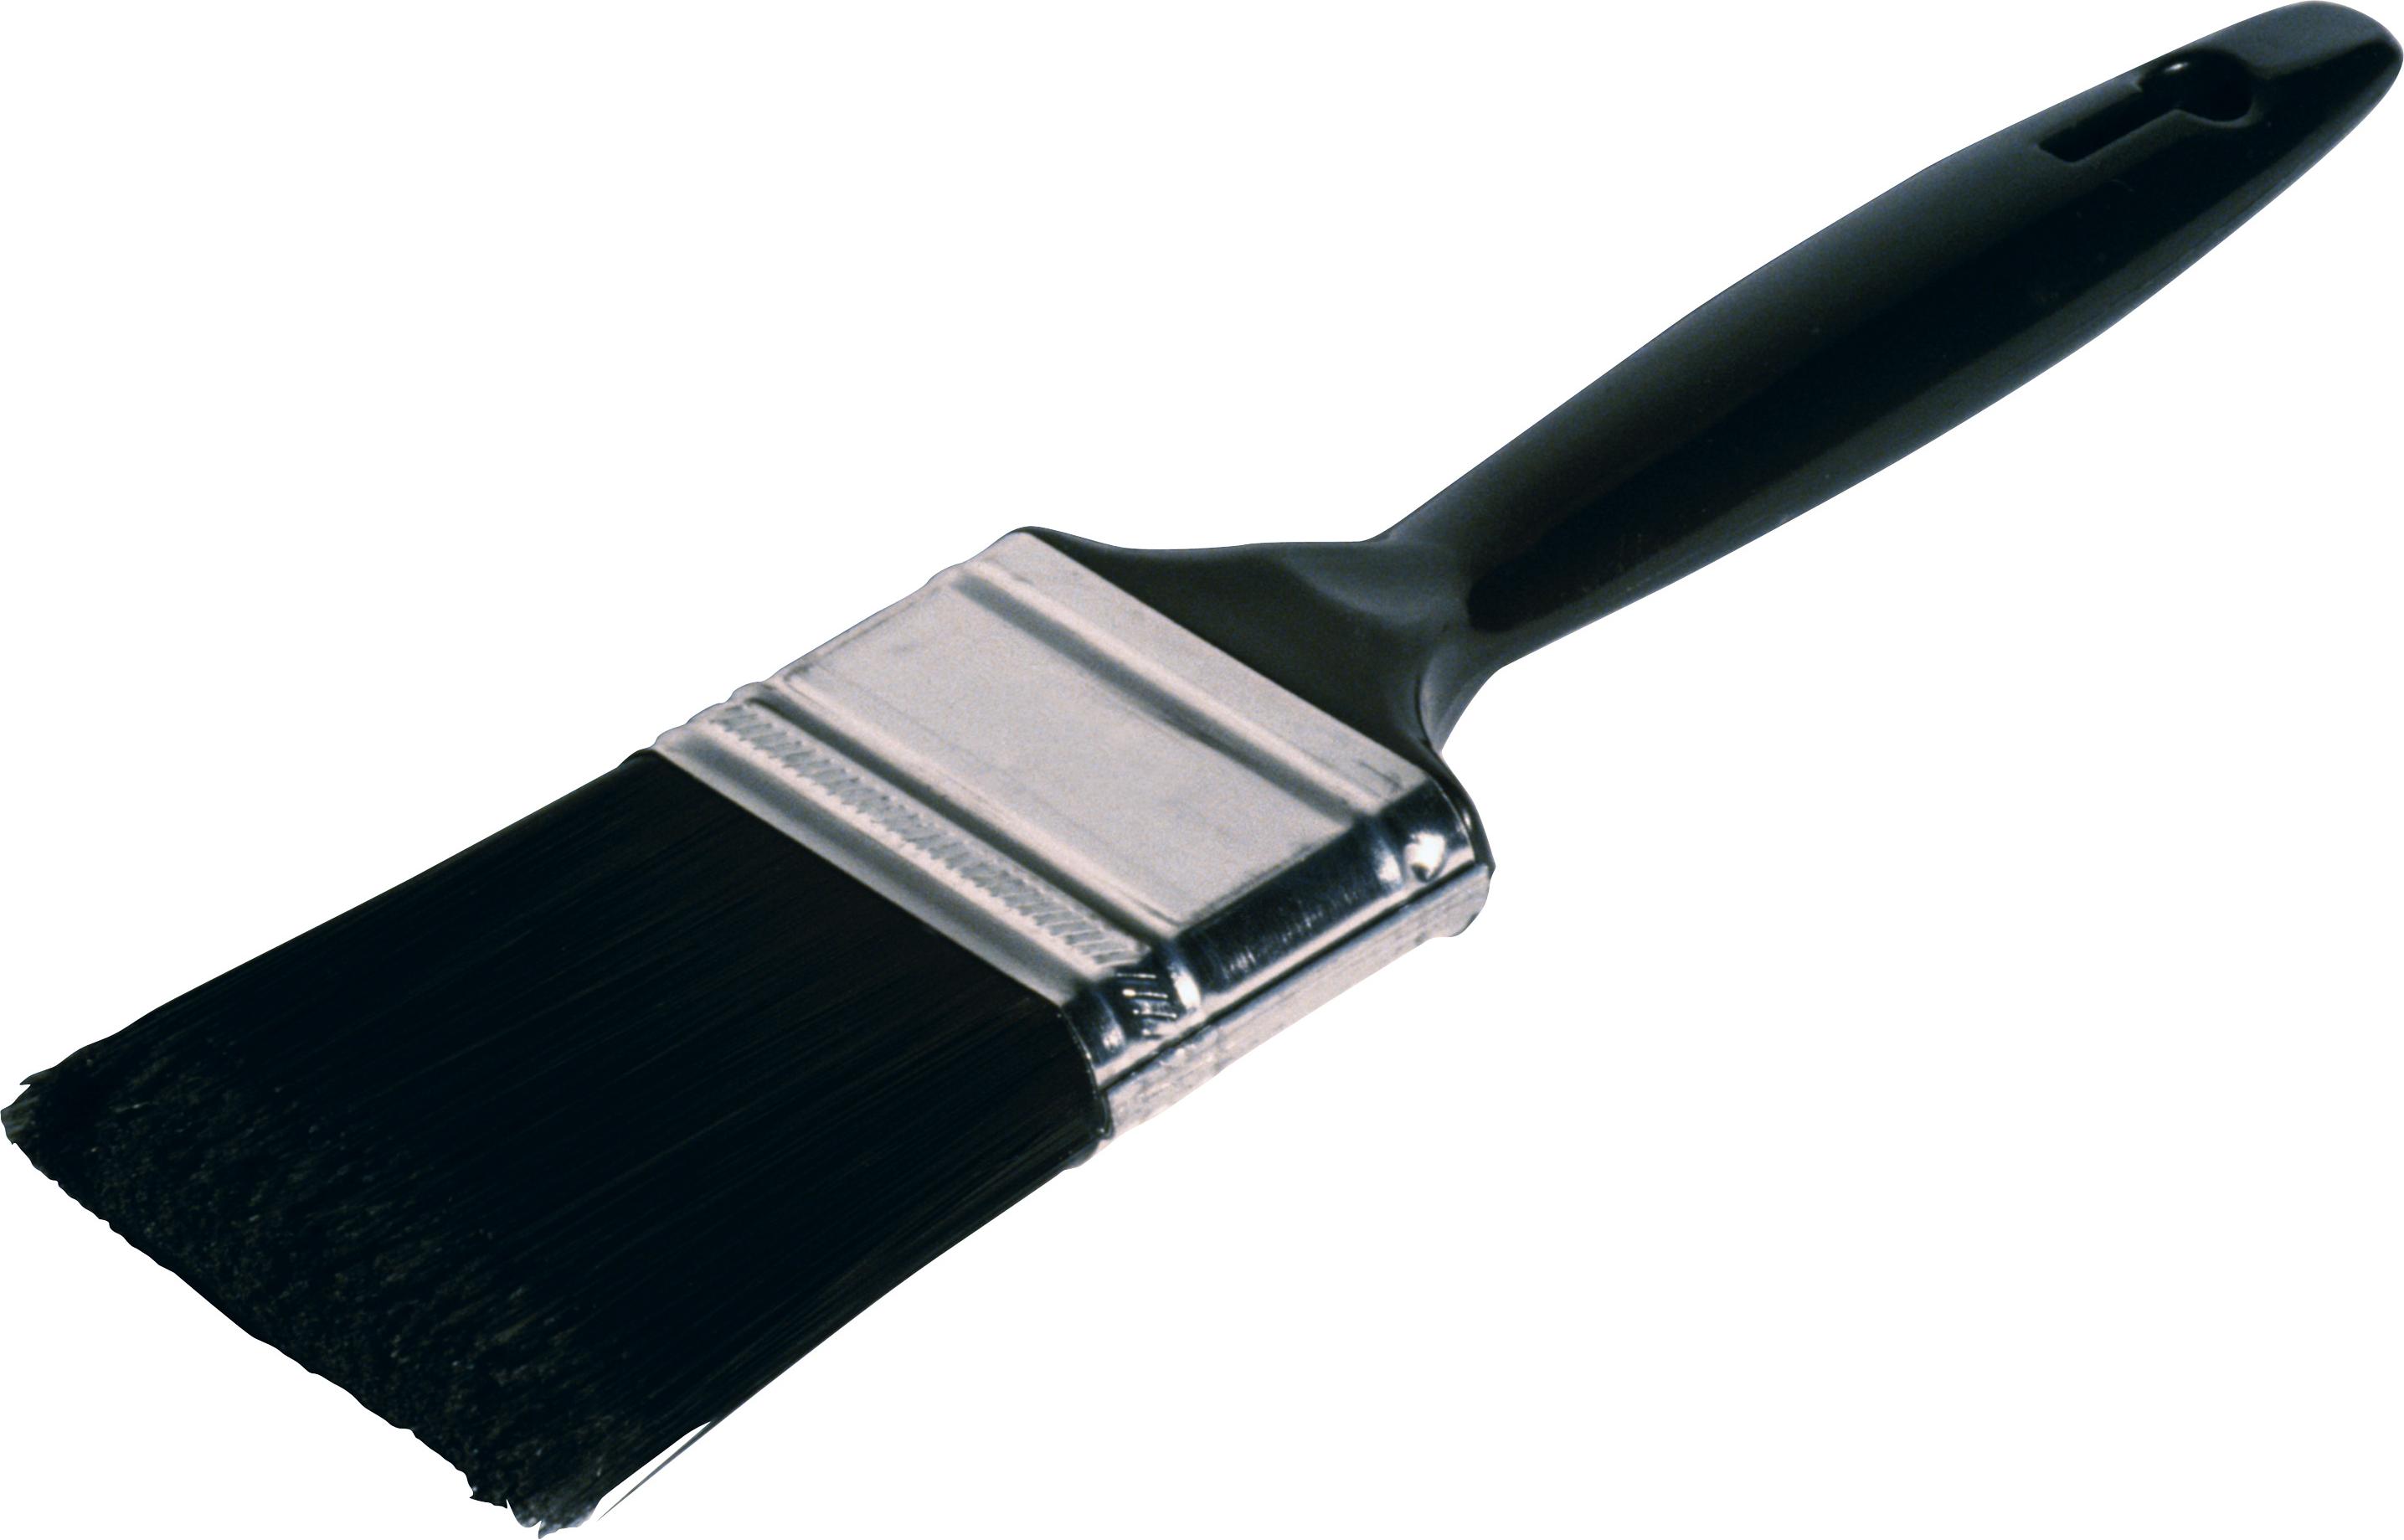 Brush Png Image - Paint Brush, Transparent background PNG HD thumbnail